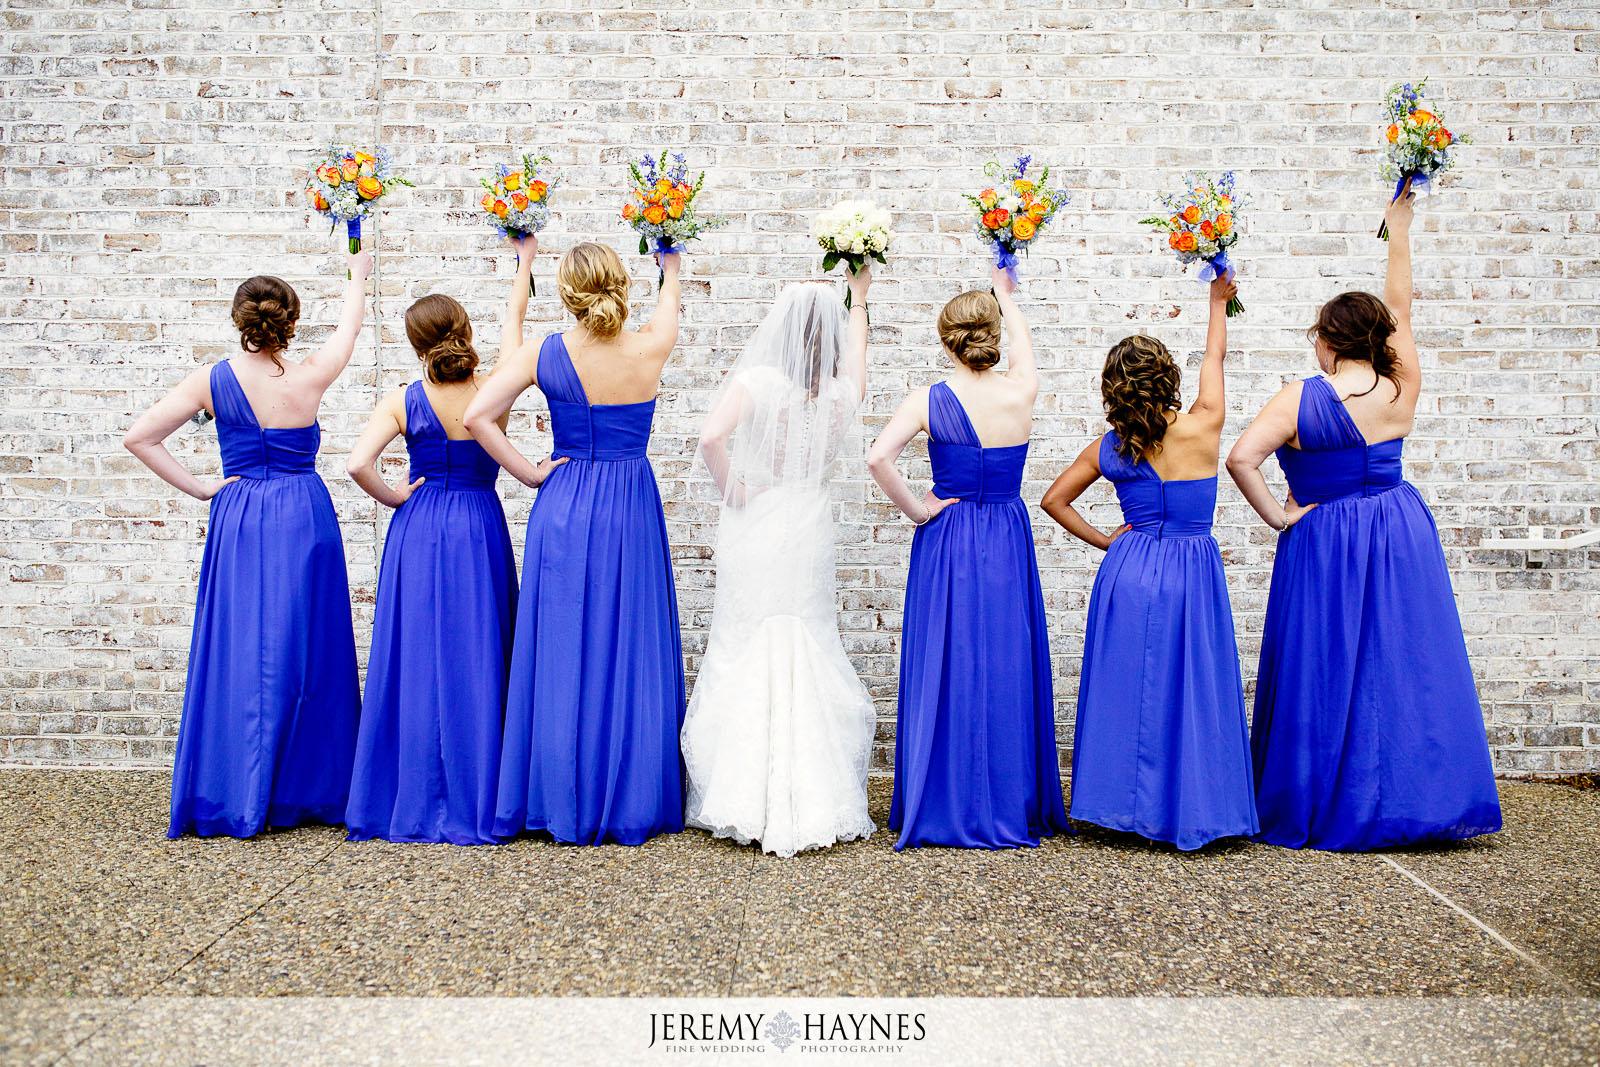 fun-wedding-bridesmaids-photos-indianapolis-jeremy-haynes-photography.jpg